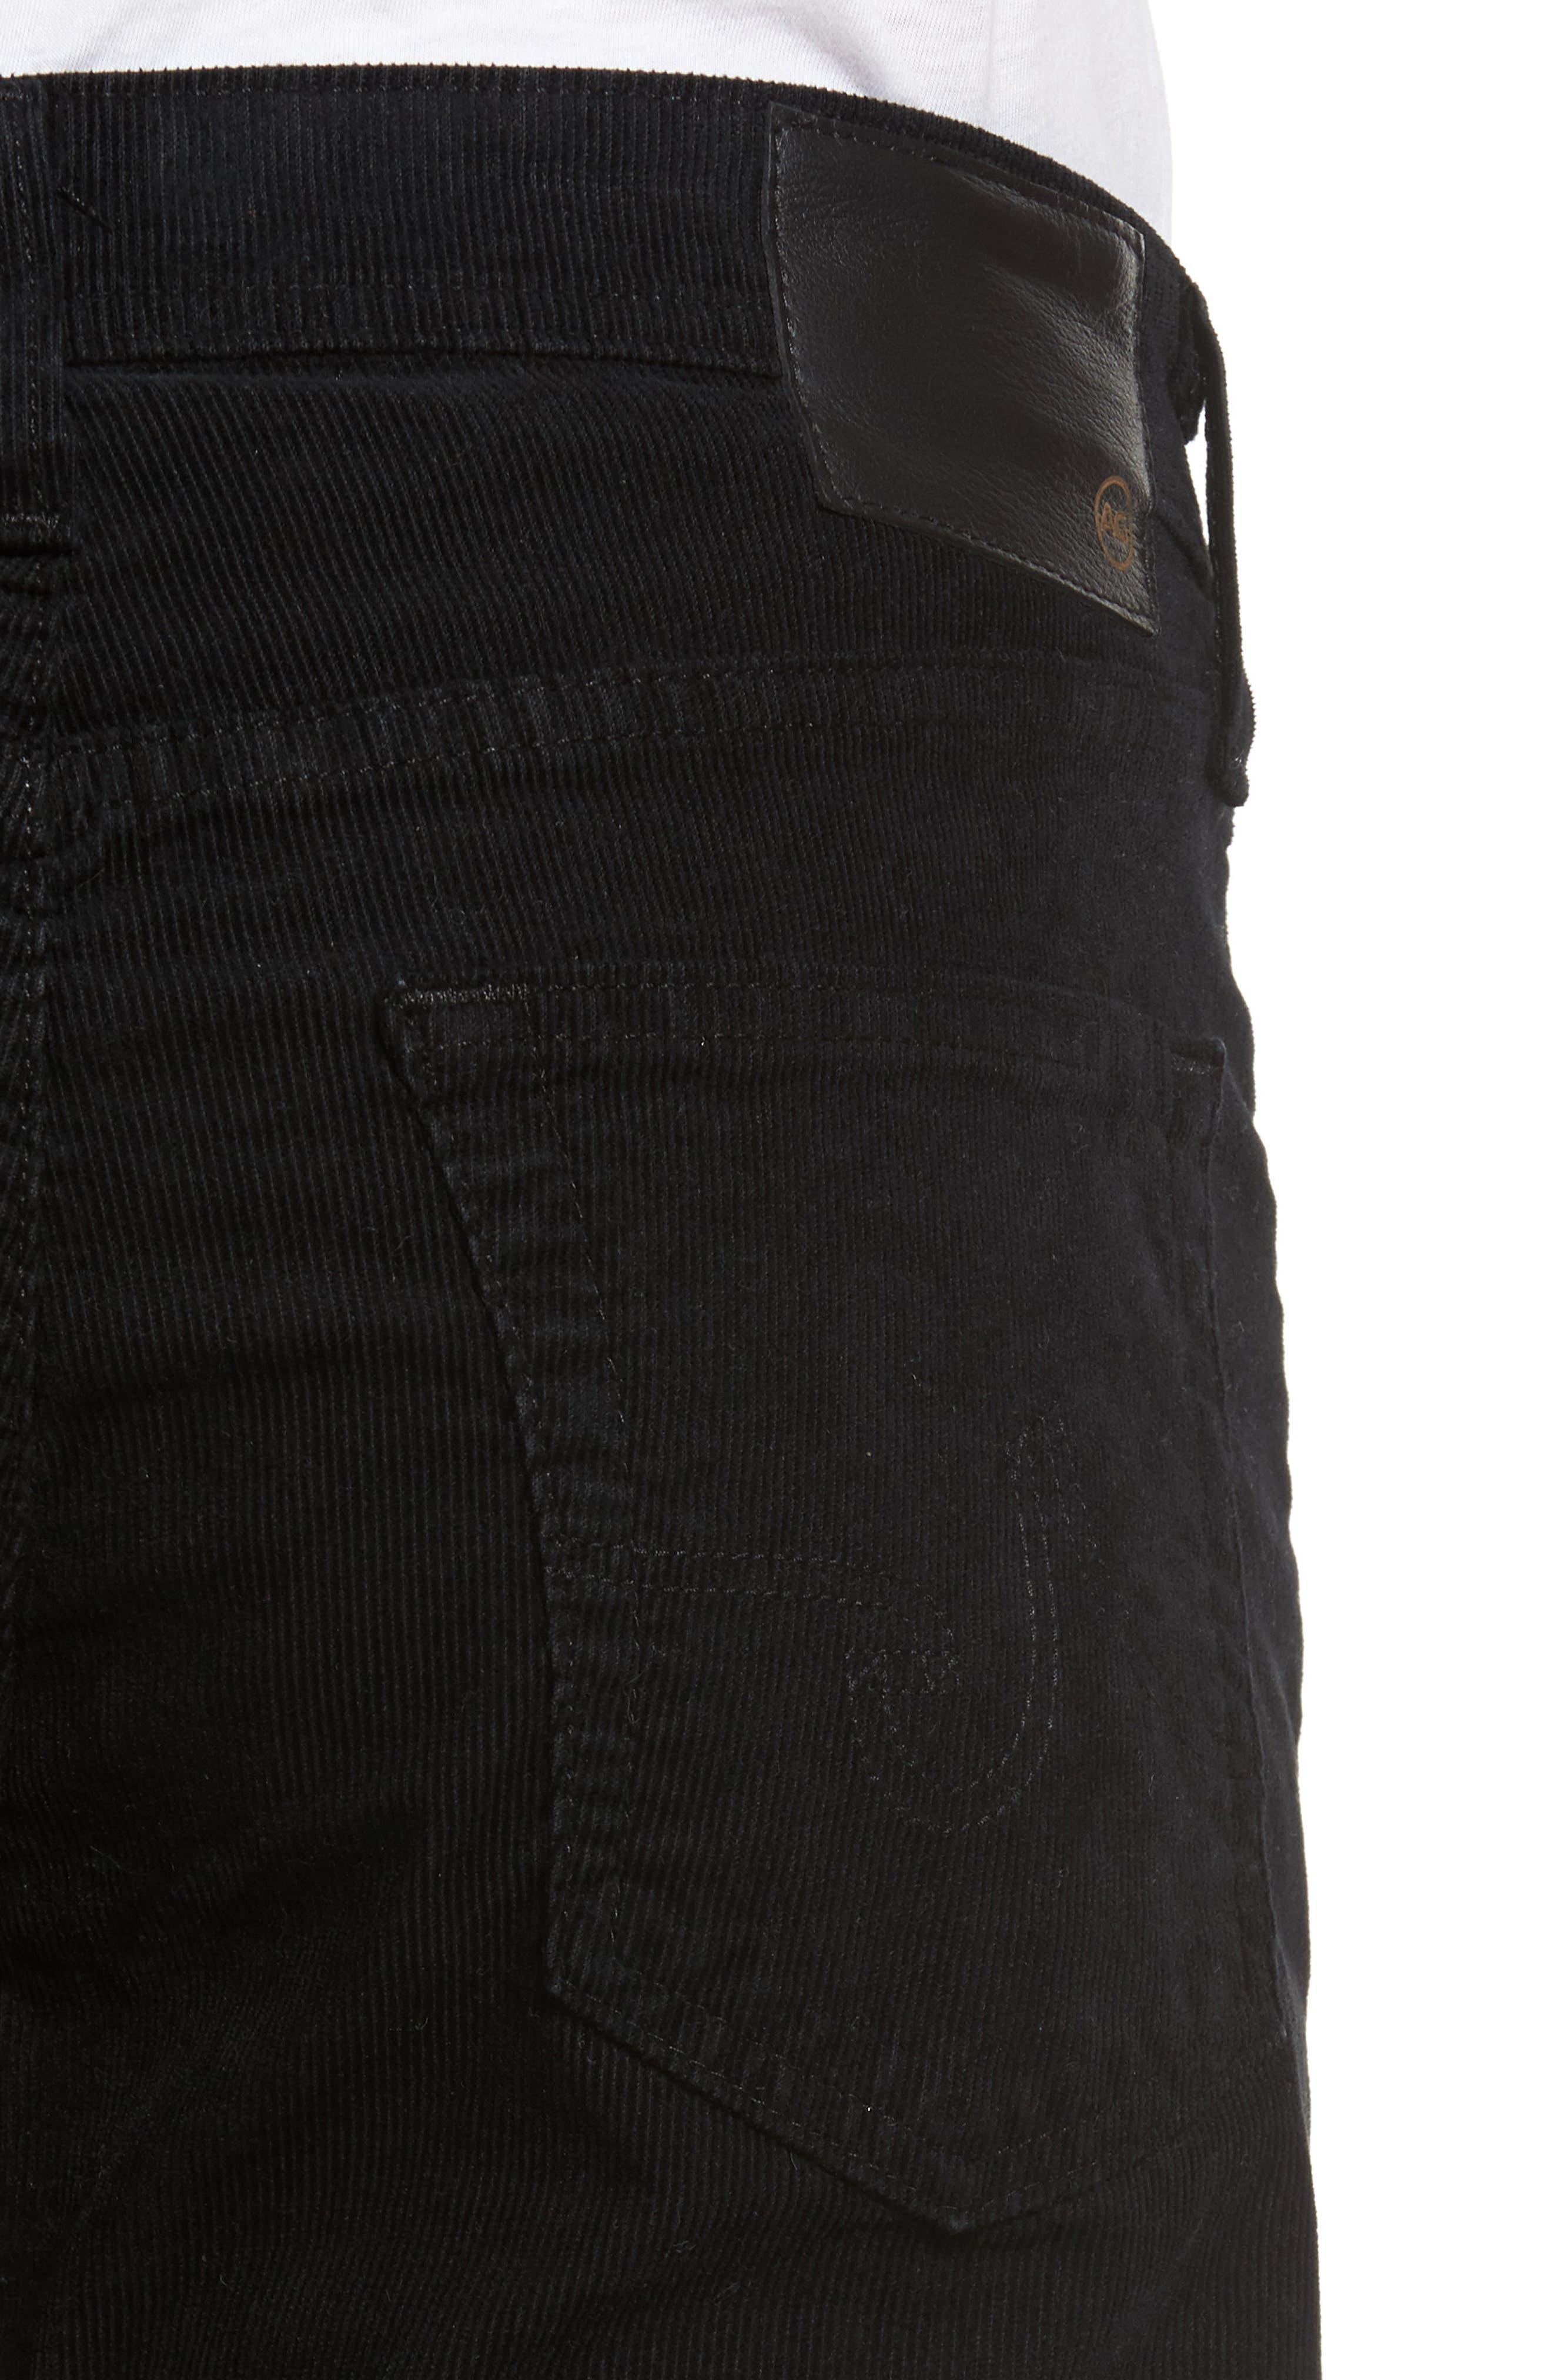 Dylan Skinny Fit Corduroy Pants,                             Alternate thumbnail 4, color,                             Sulfur True Black